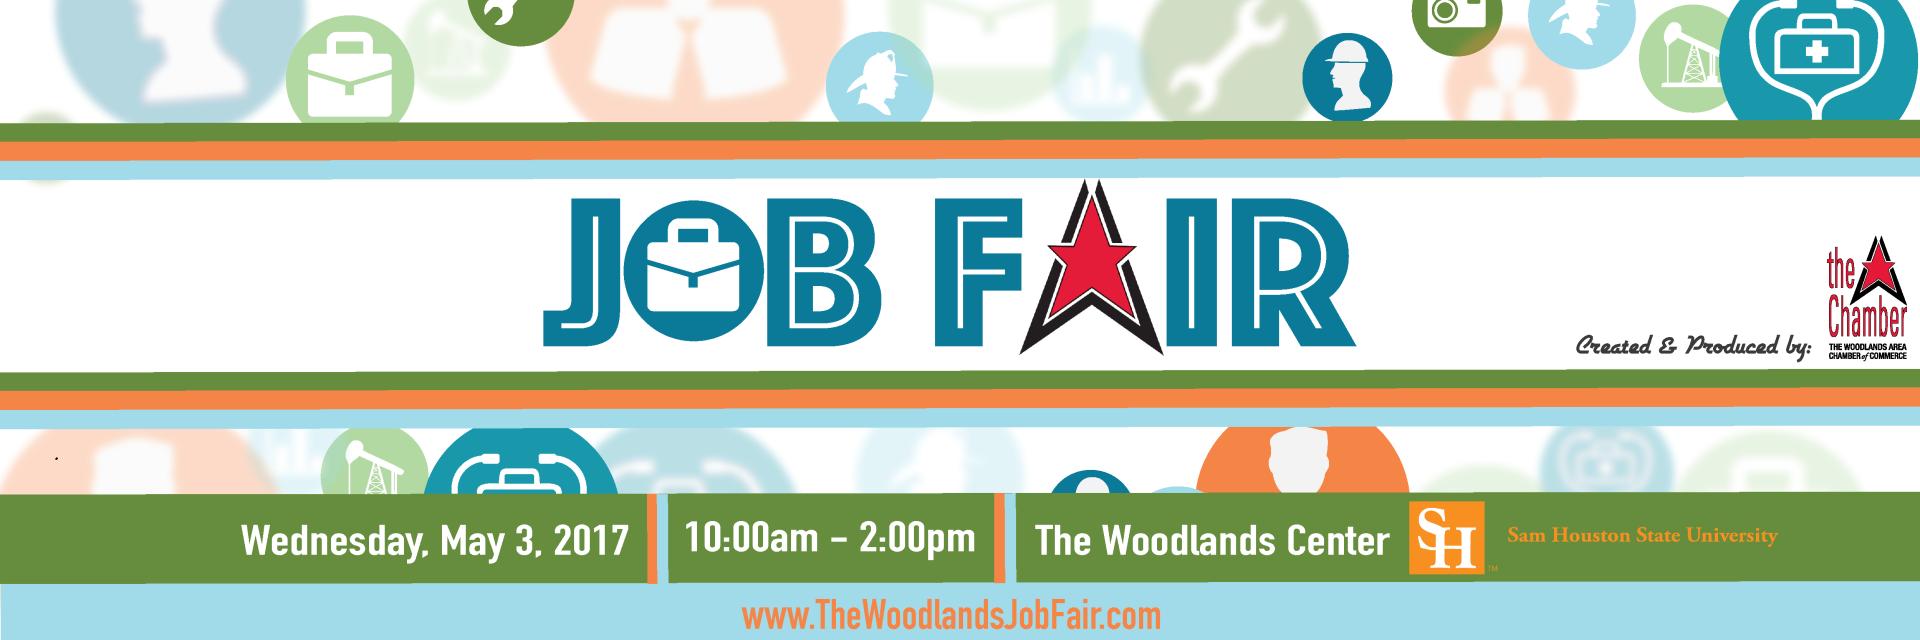 Job-Fair-Web-Banner-2017-01-w1920.png